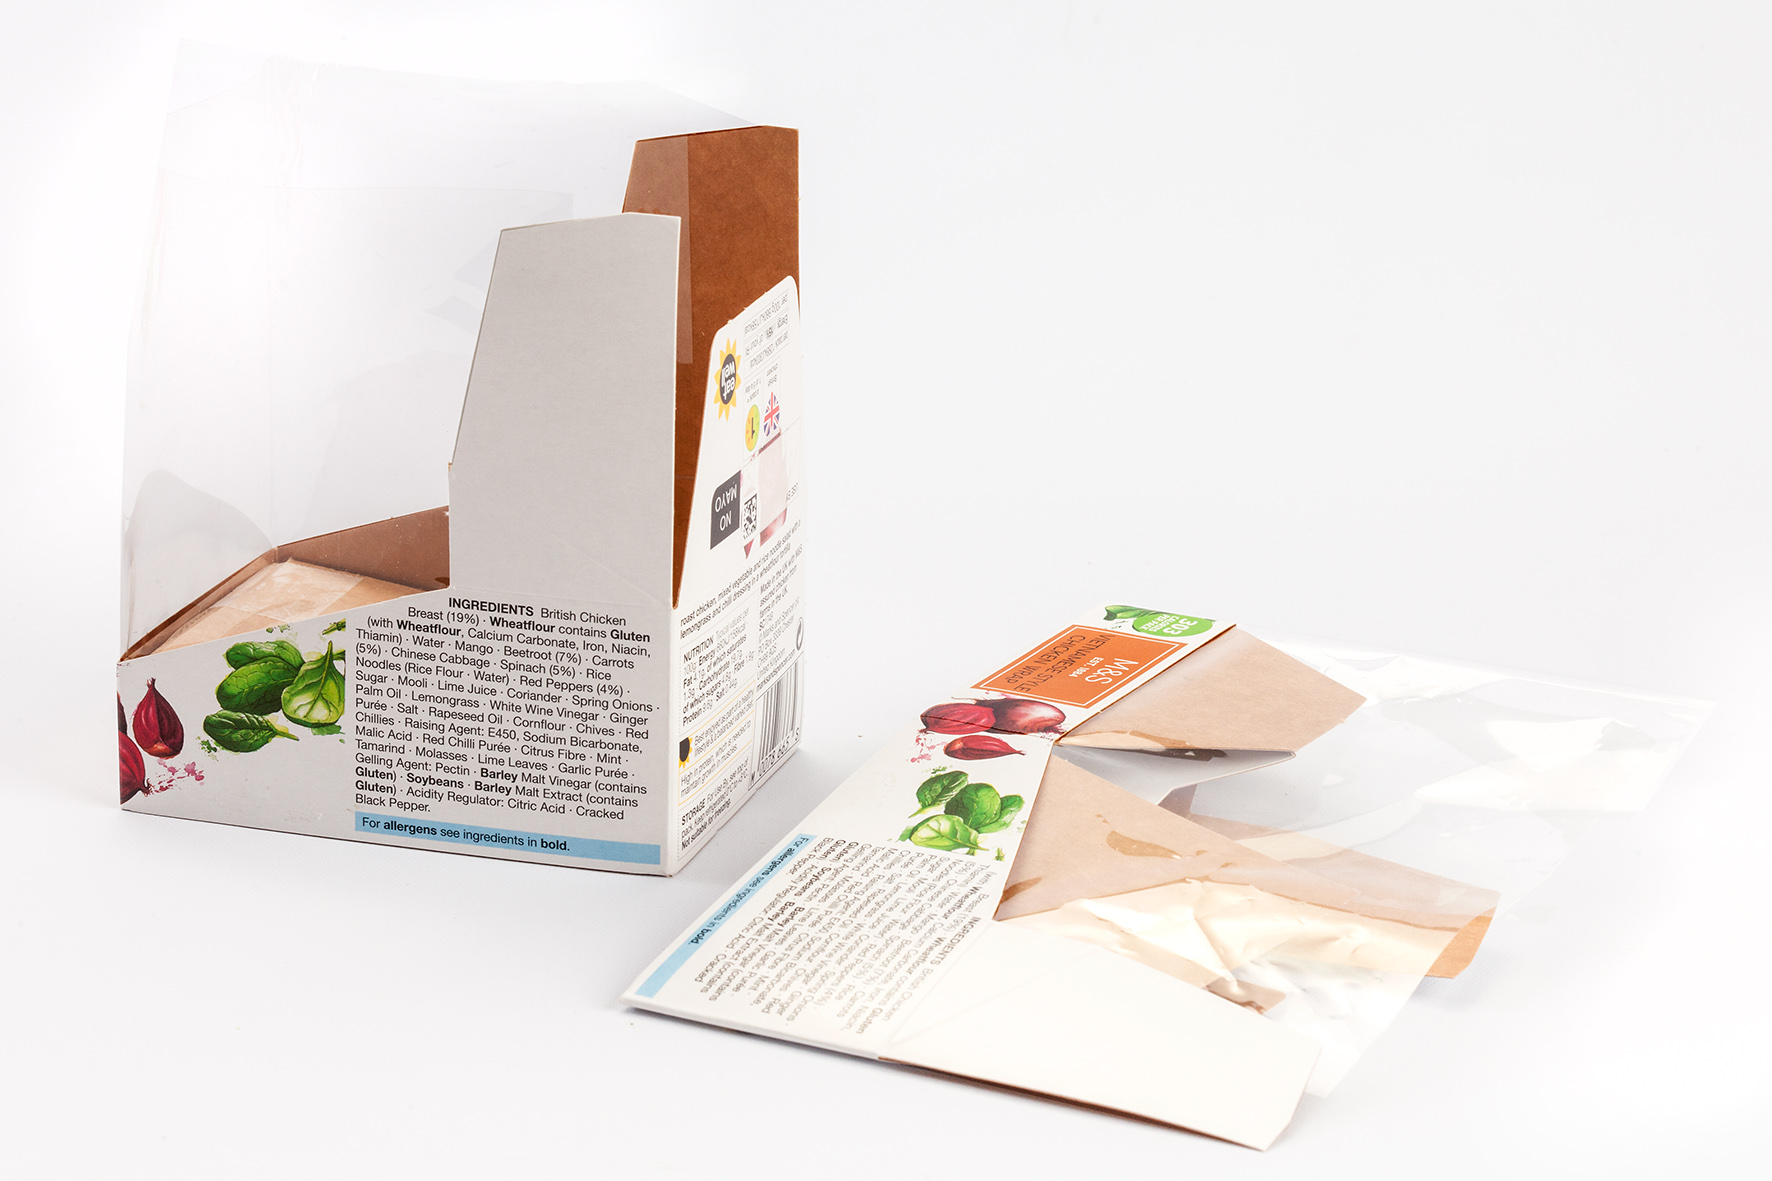 carton-award-image 129682